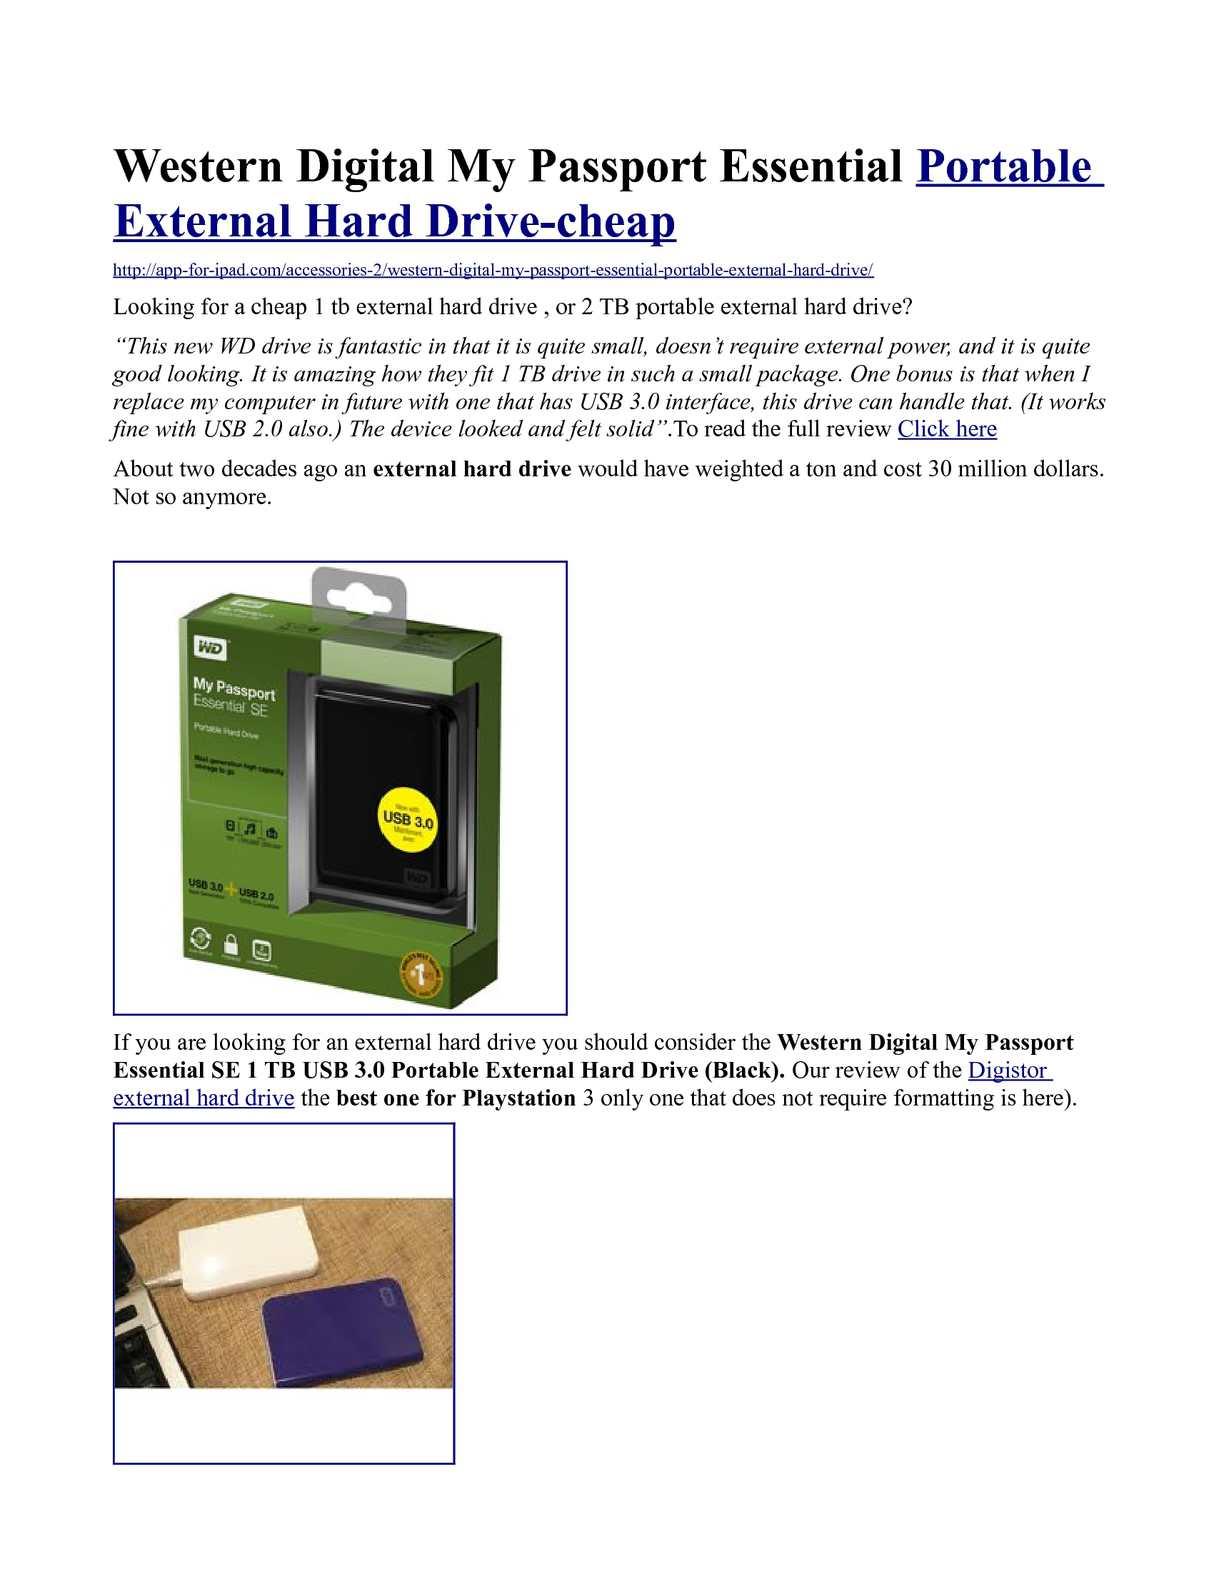 USB Cable Western Digital My Passport Essential SE 1TB External Hard Drive